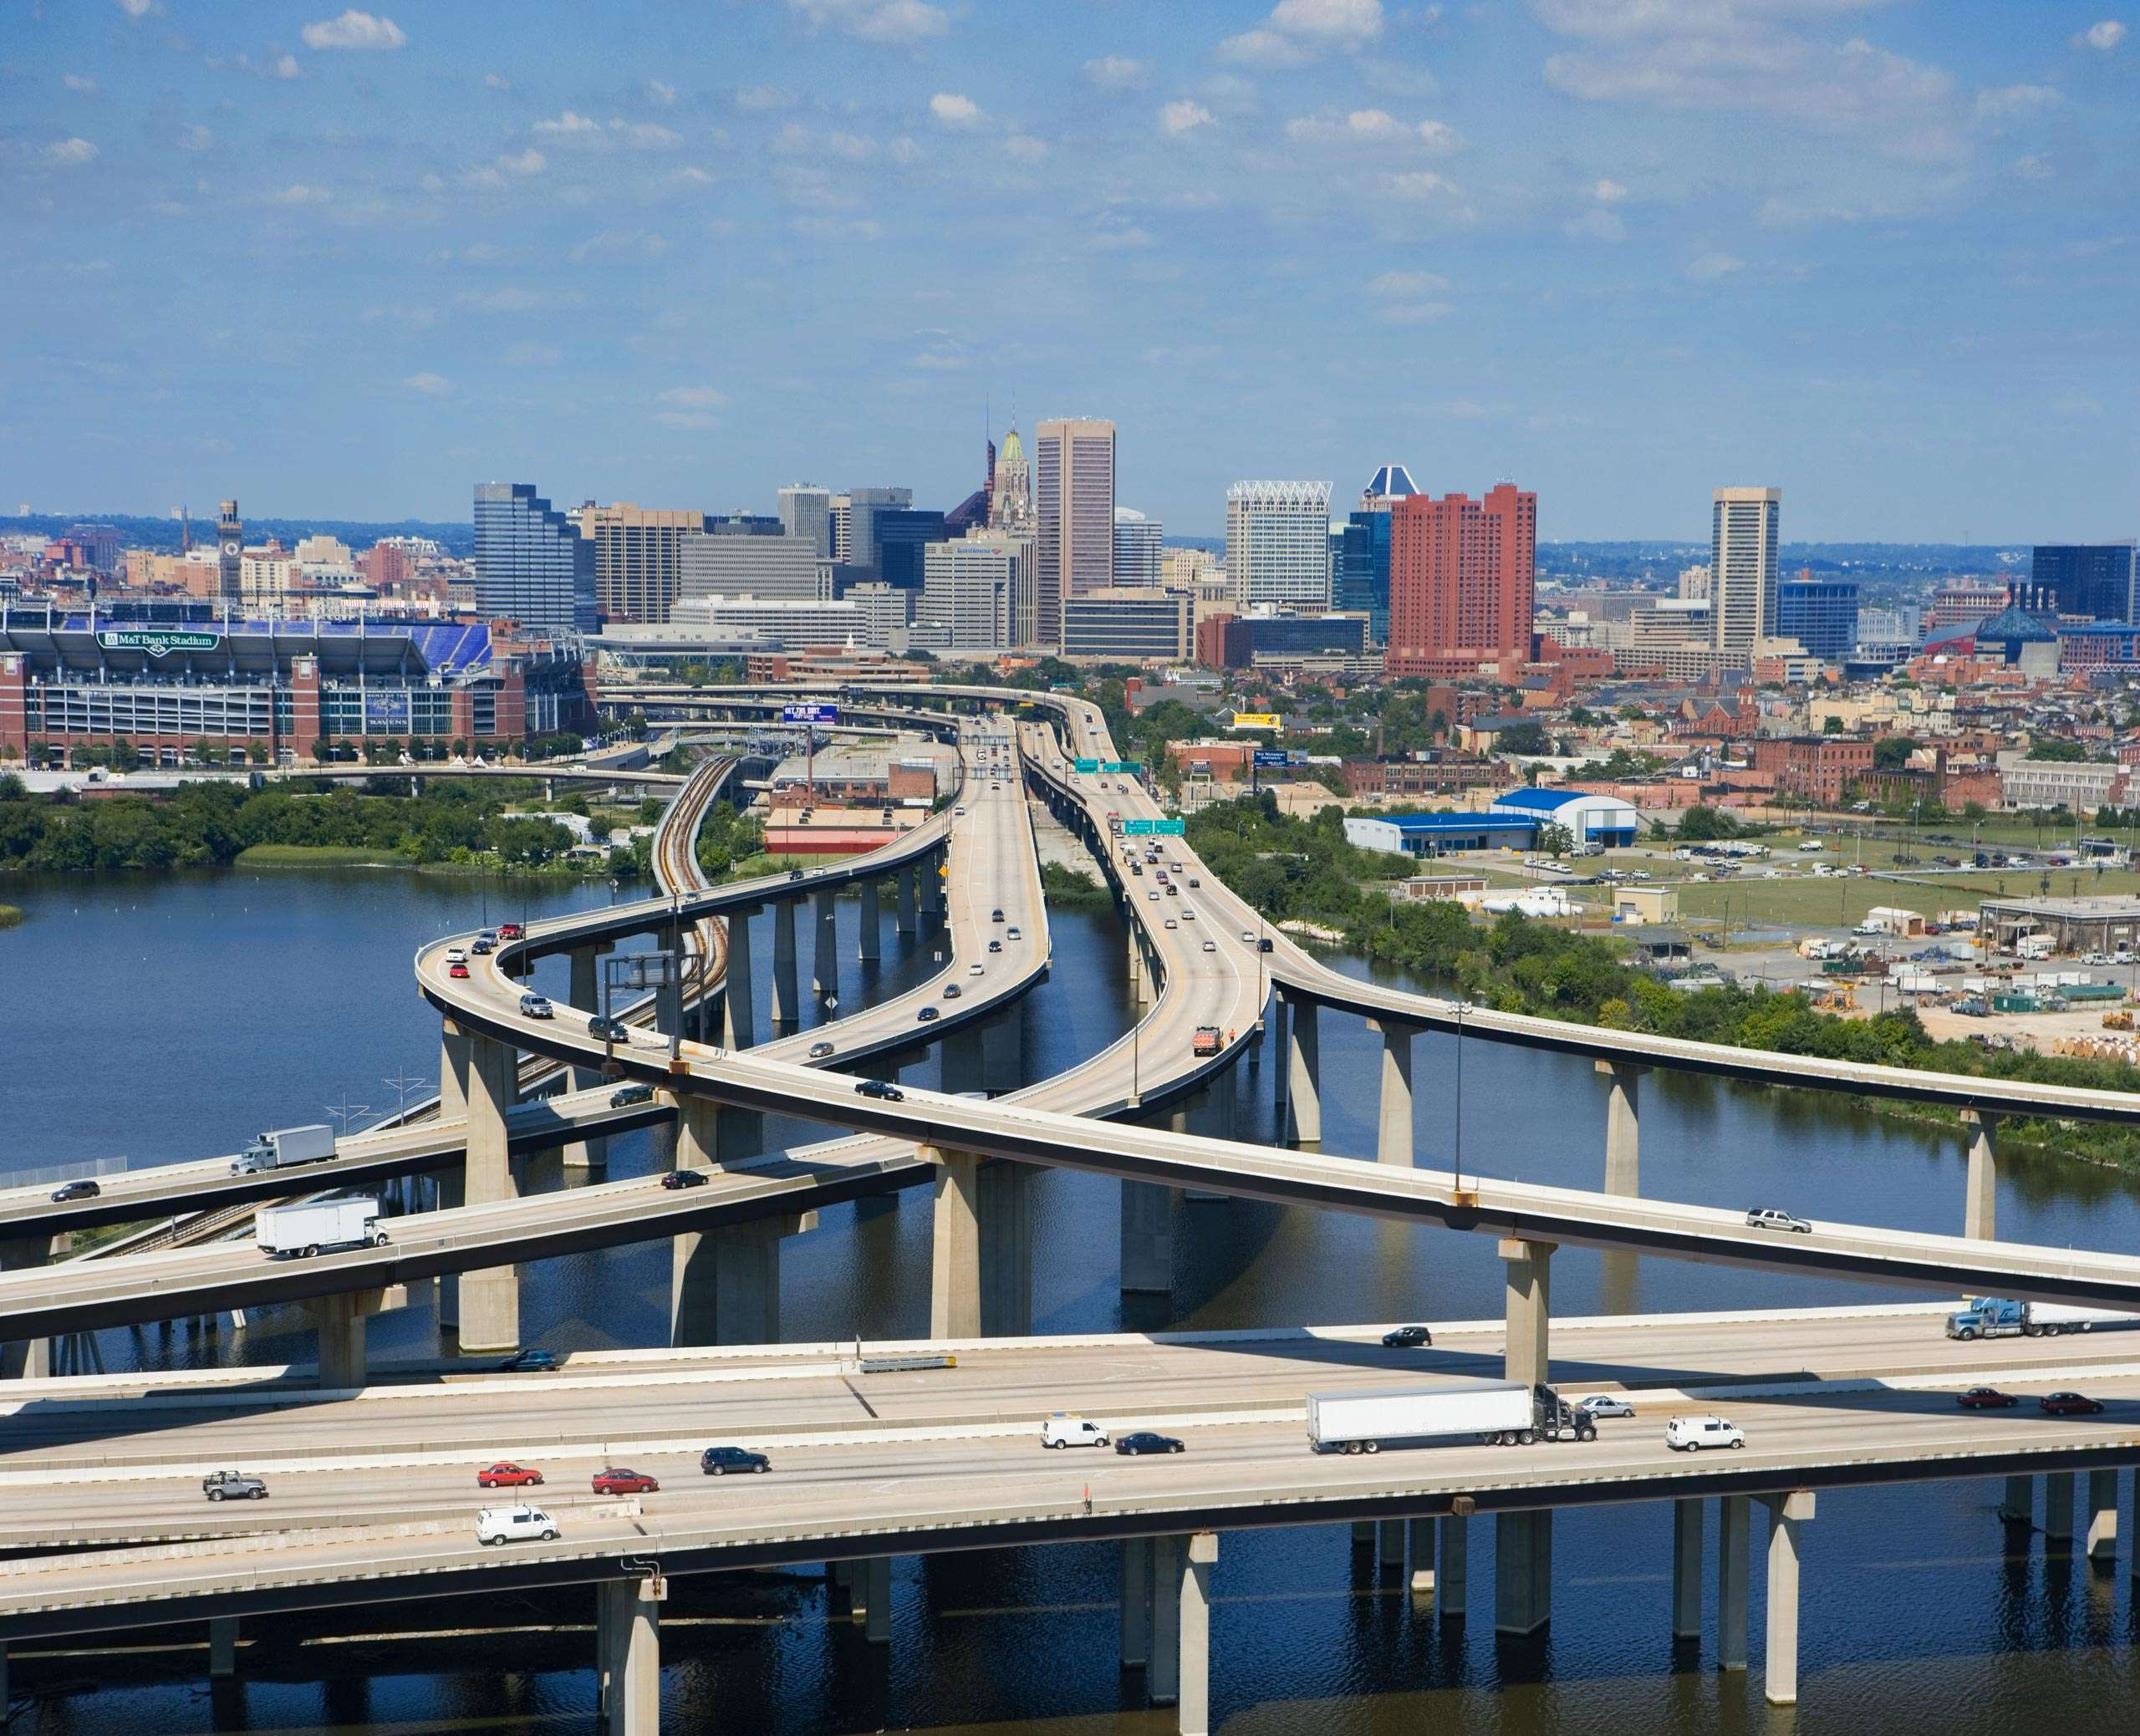 PORTFOLIO - Baltimore - Skyline  #2  PCG265